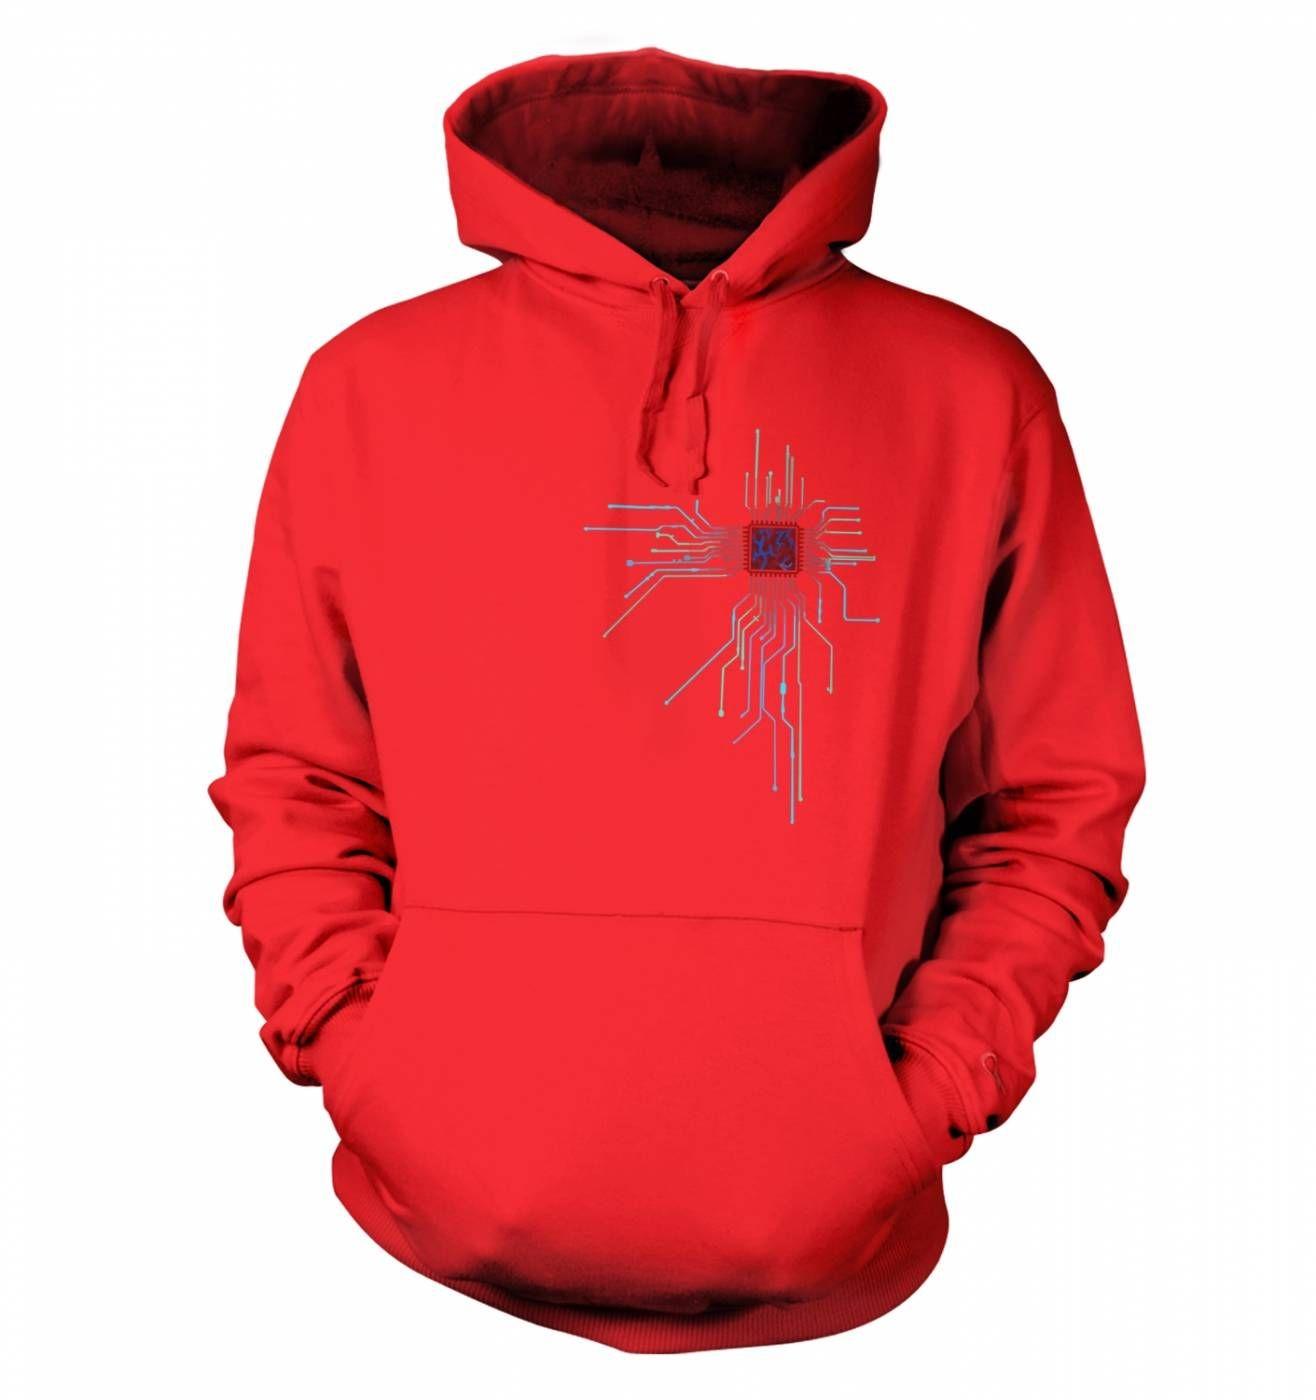 CPU Heart hoodie